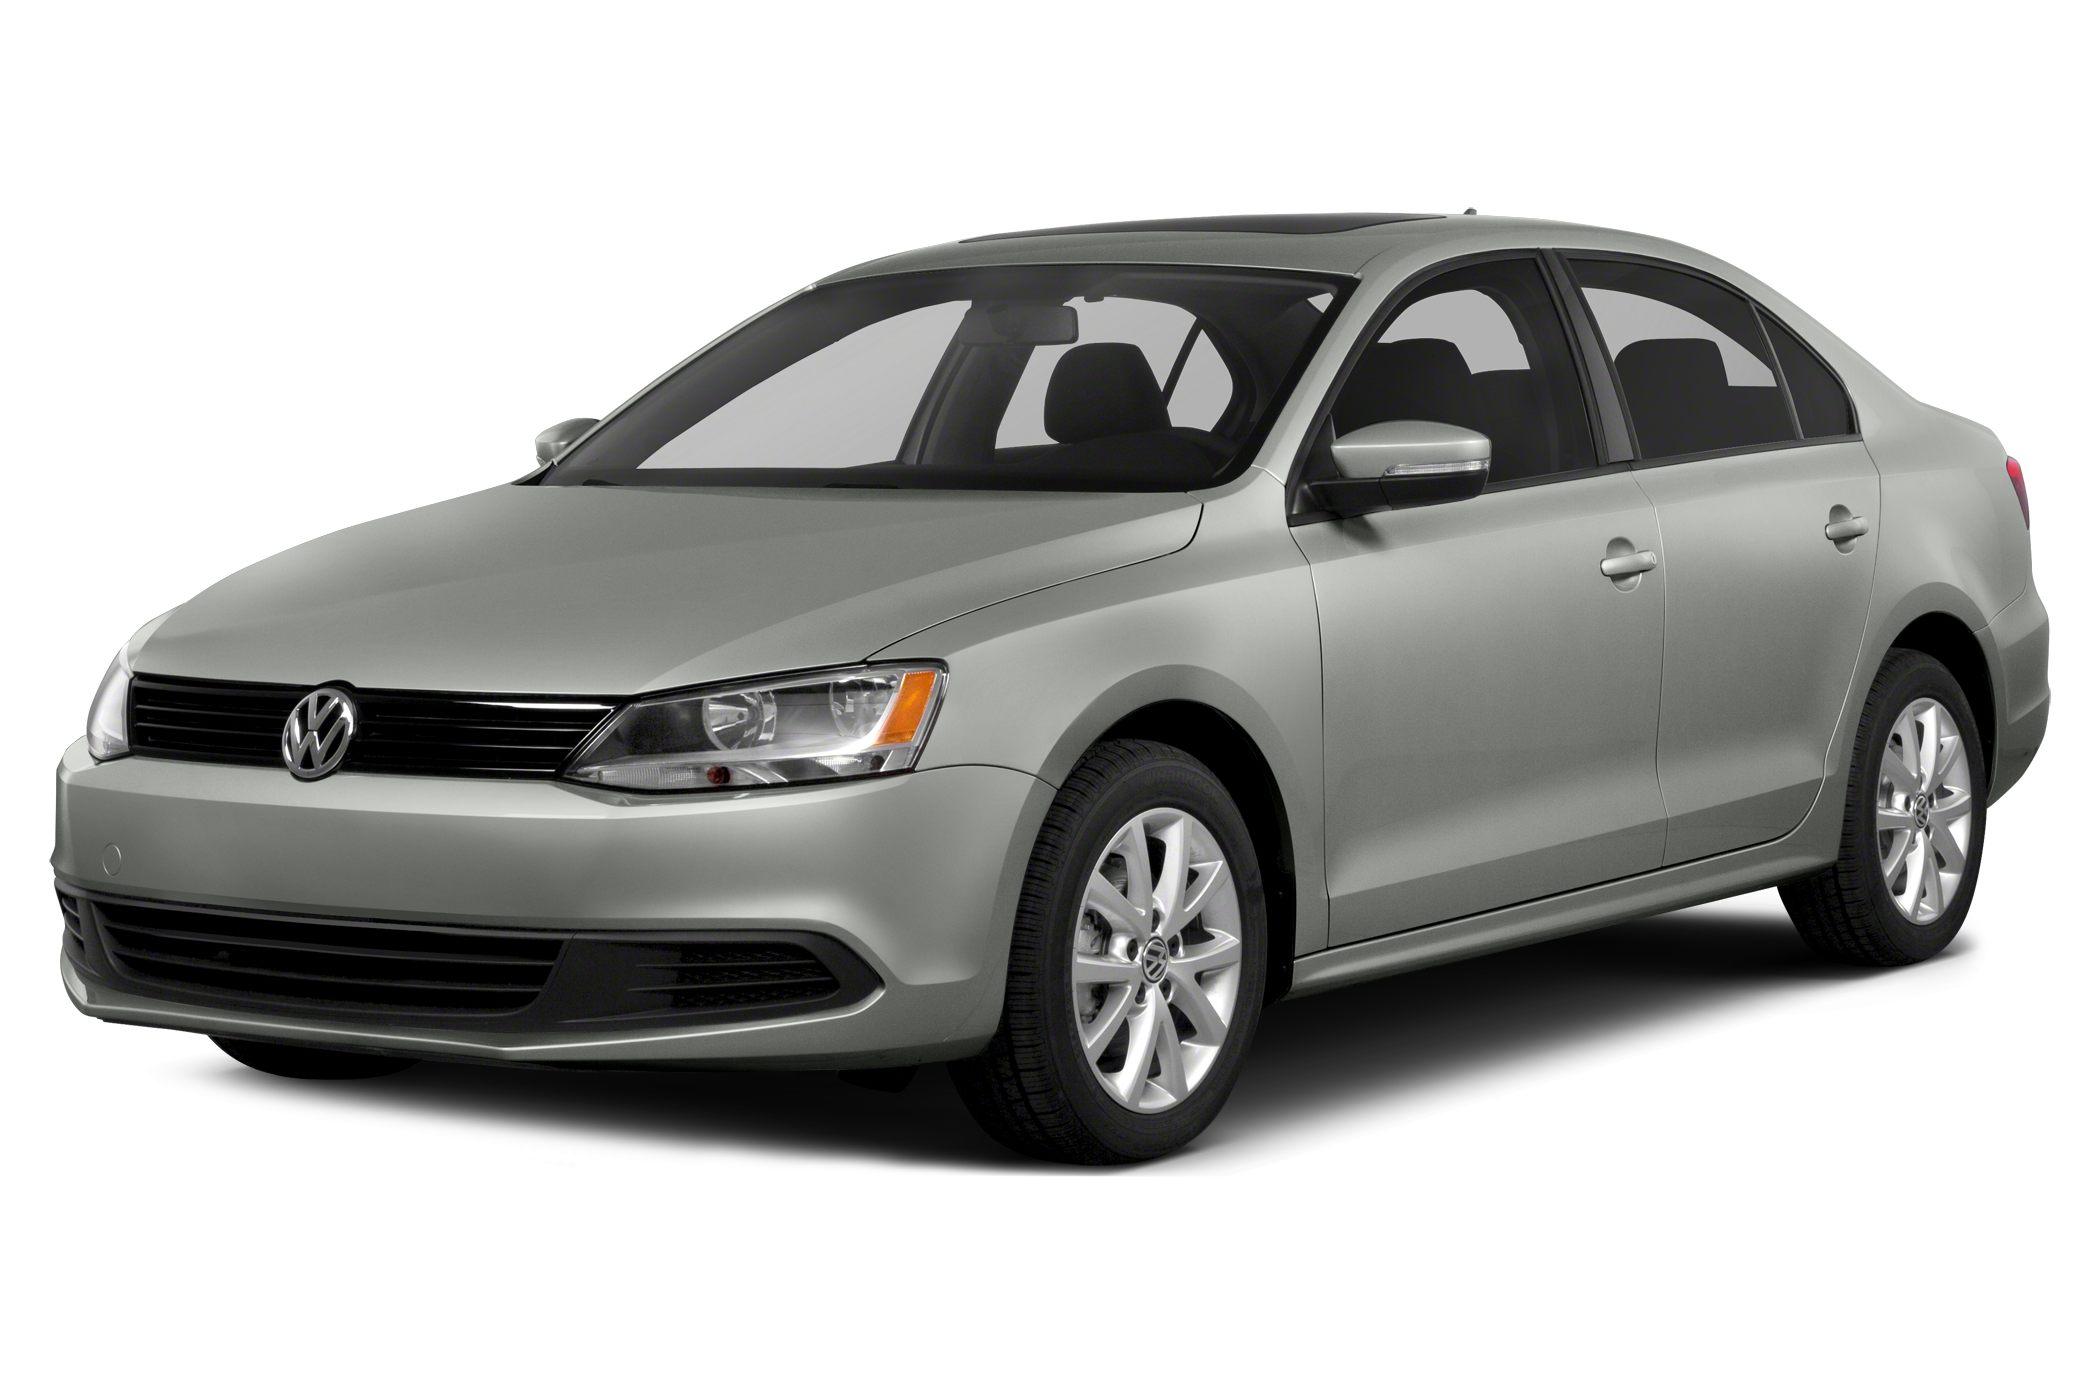 2014 Volkswagen Jetta SE Sedan for sale in Saint Cloud for $22,180 with 75 miles